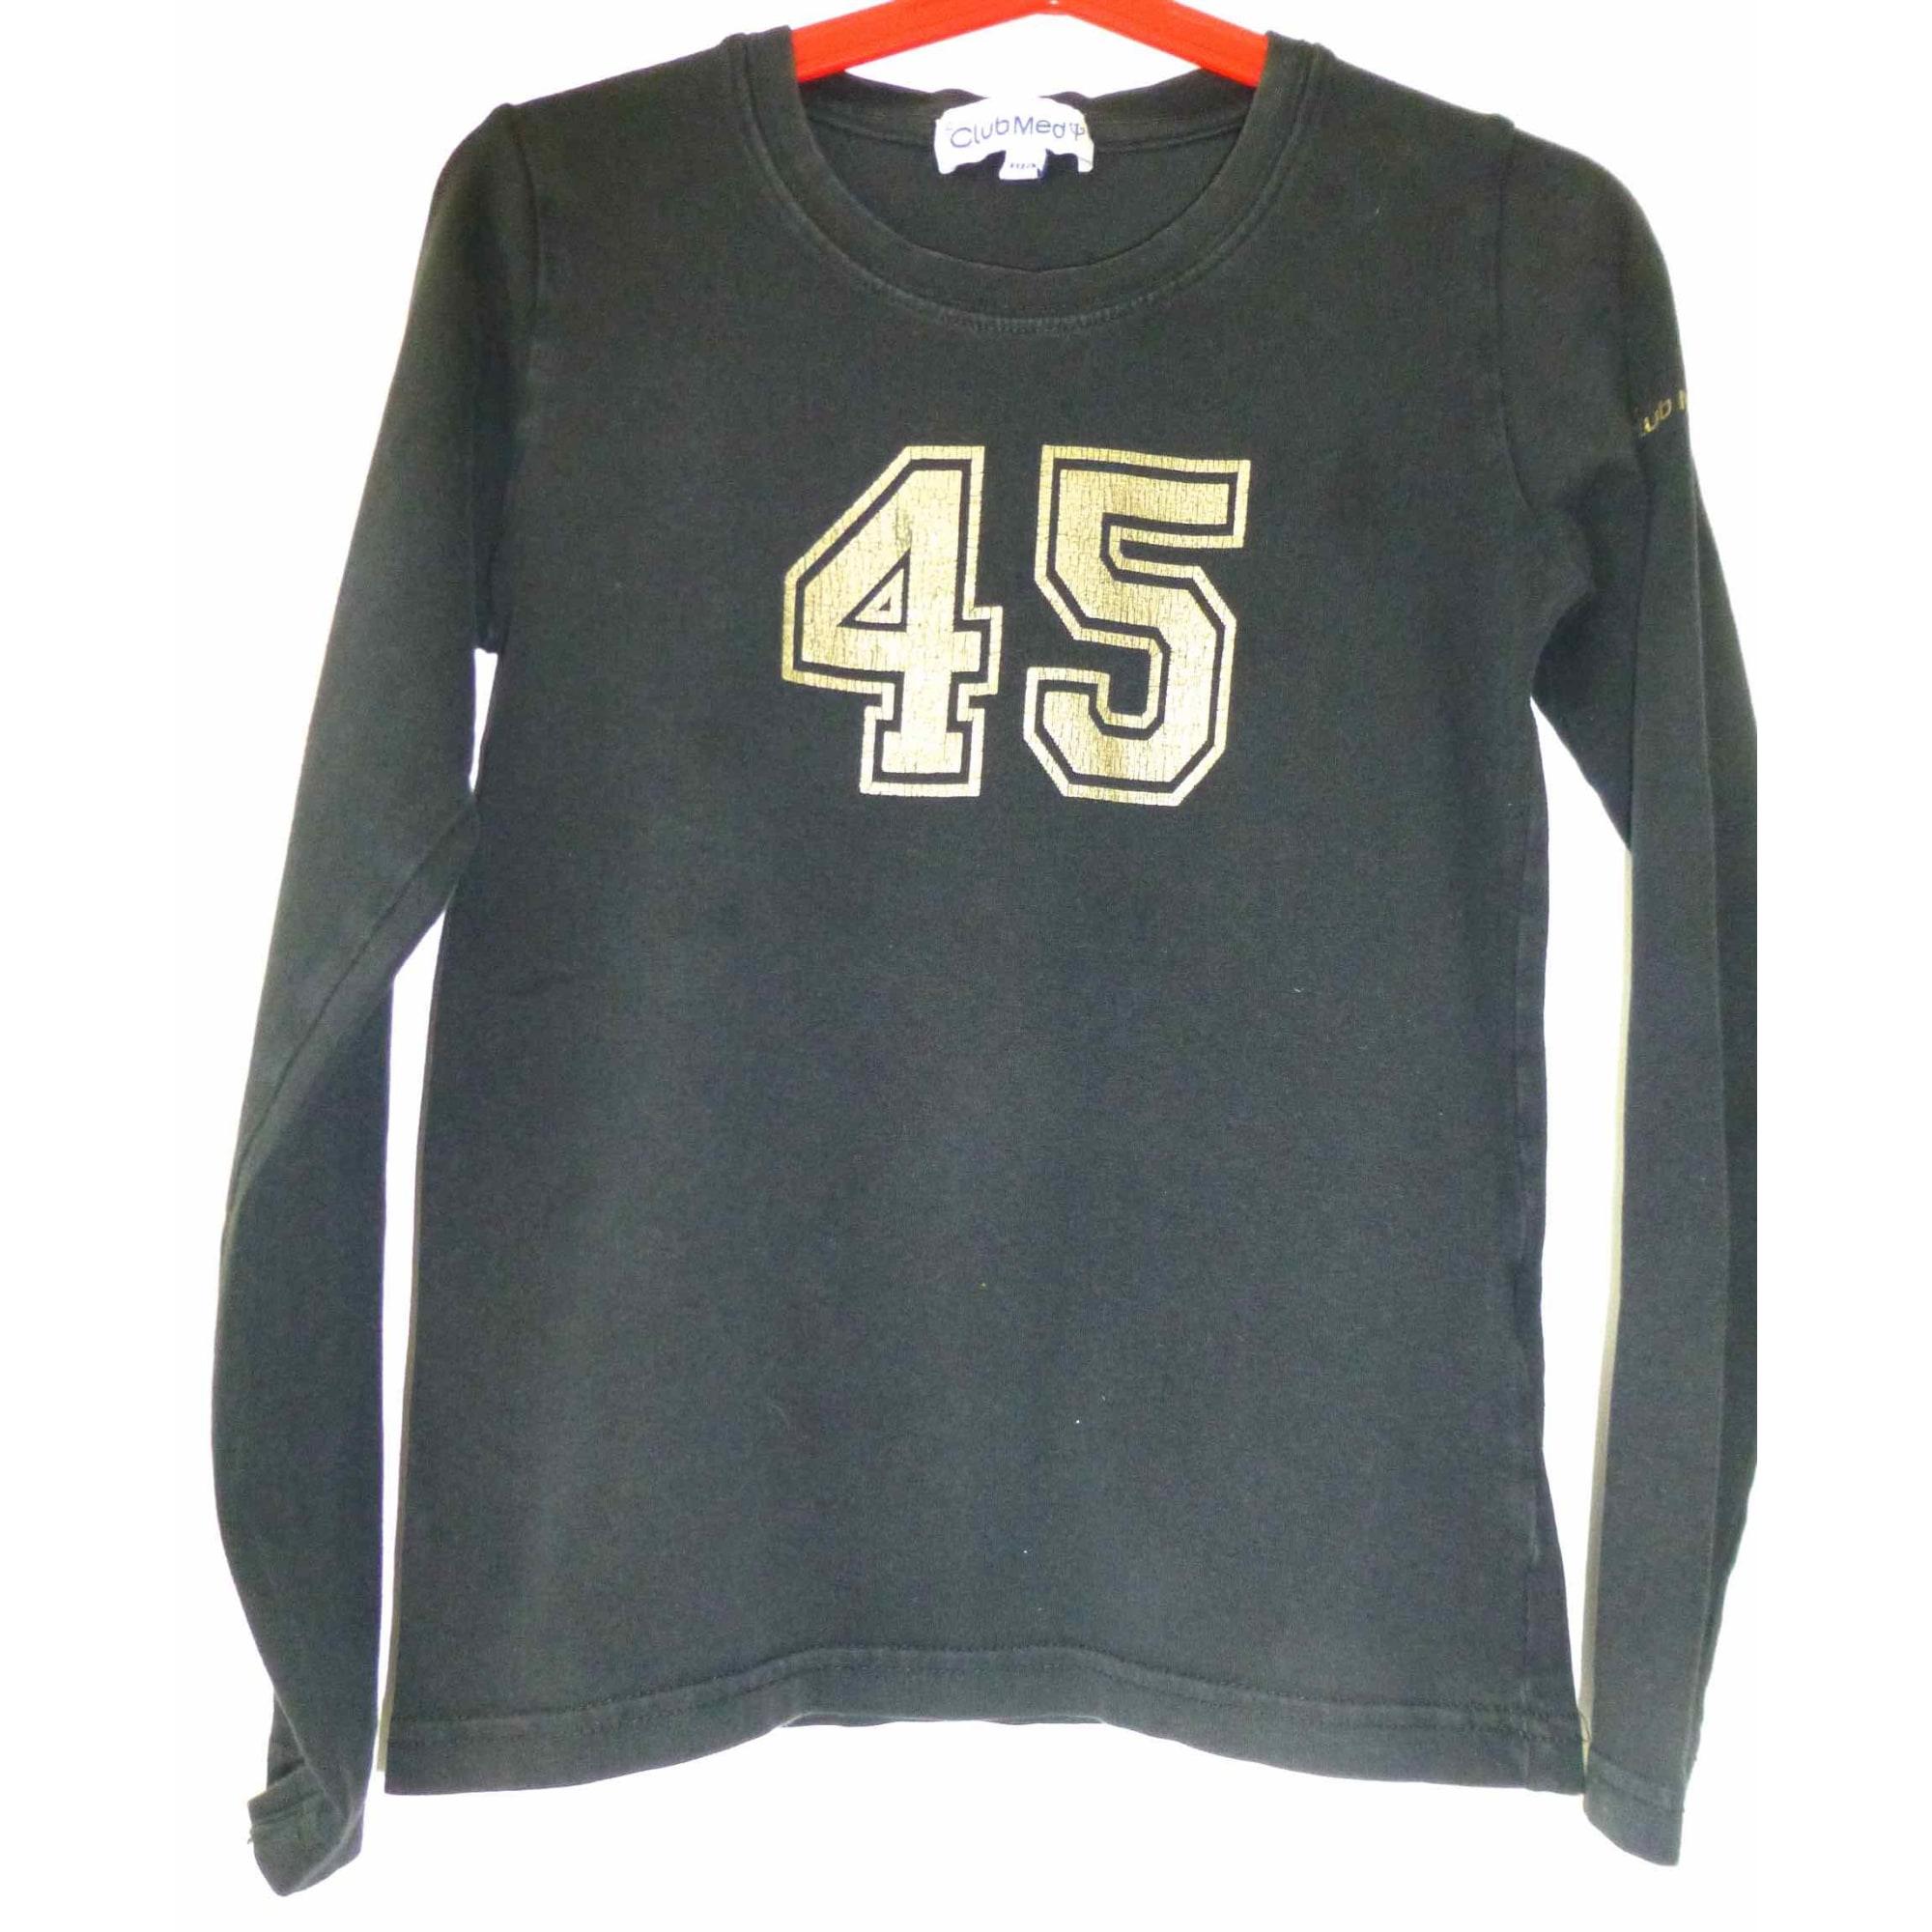 6a7f74141f21 Tee-shirt CLUB MED 7-8 ans noir - 6382144